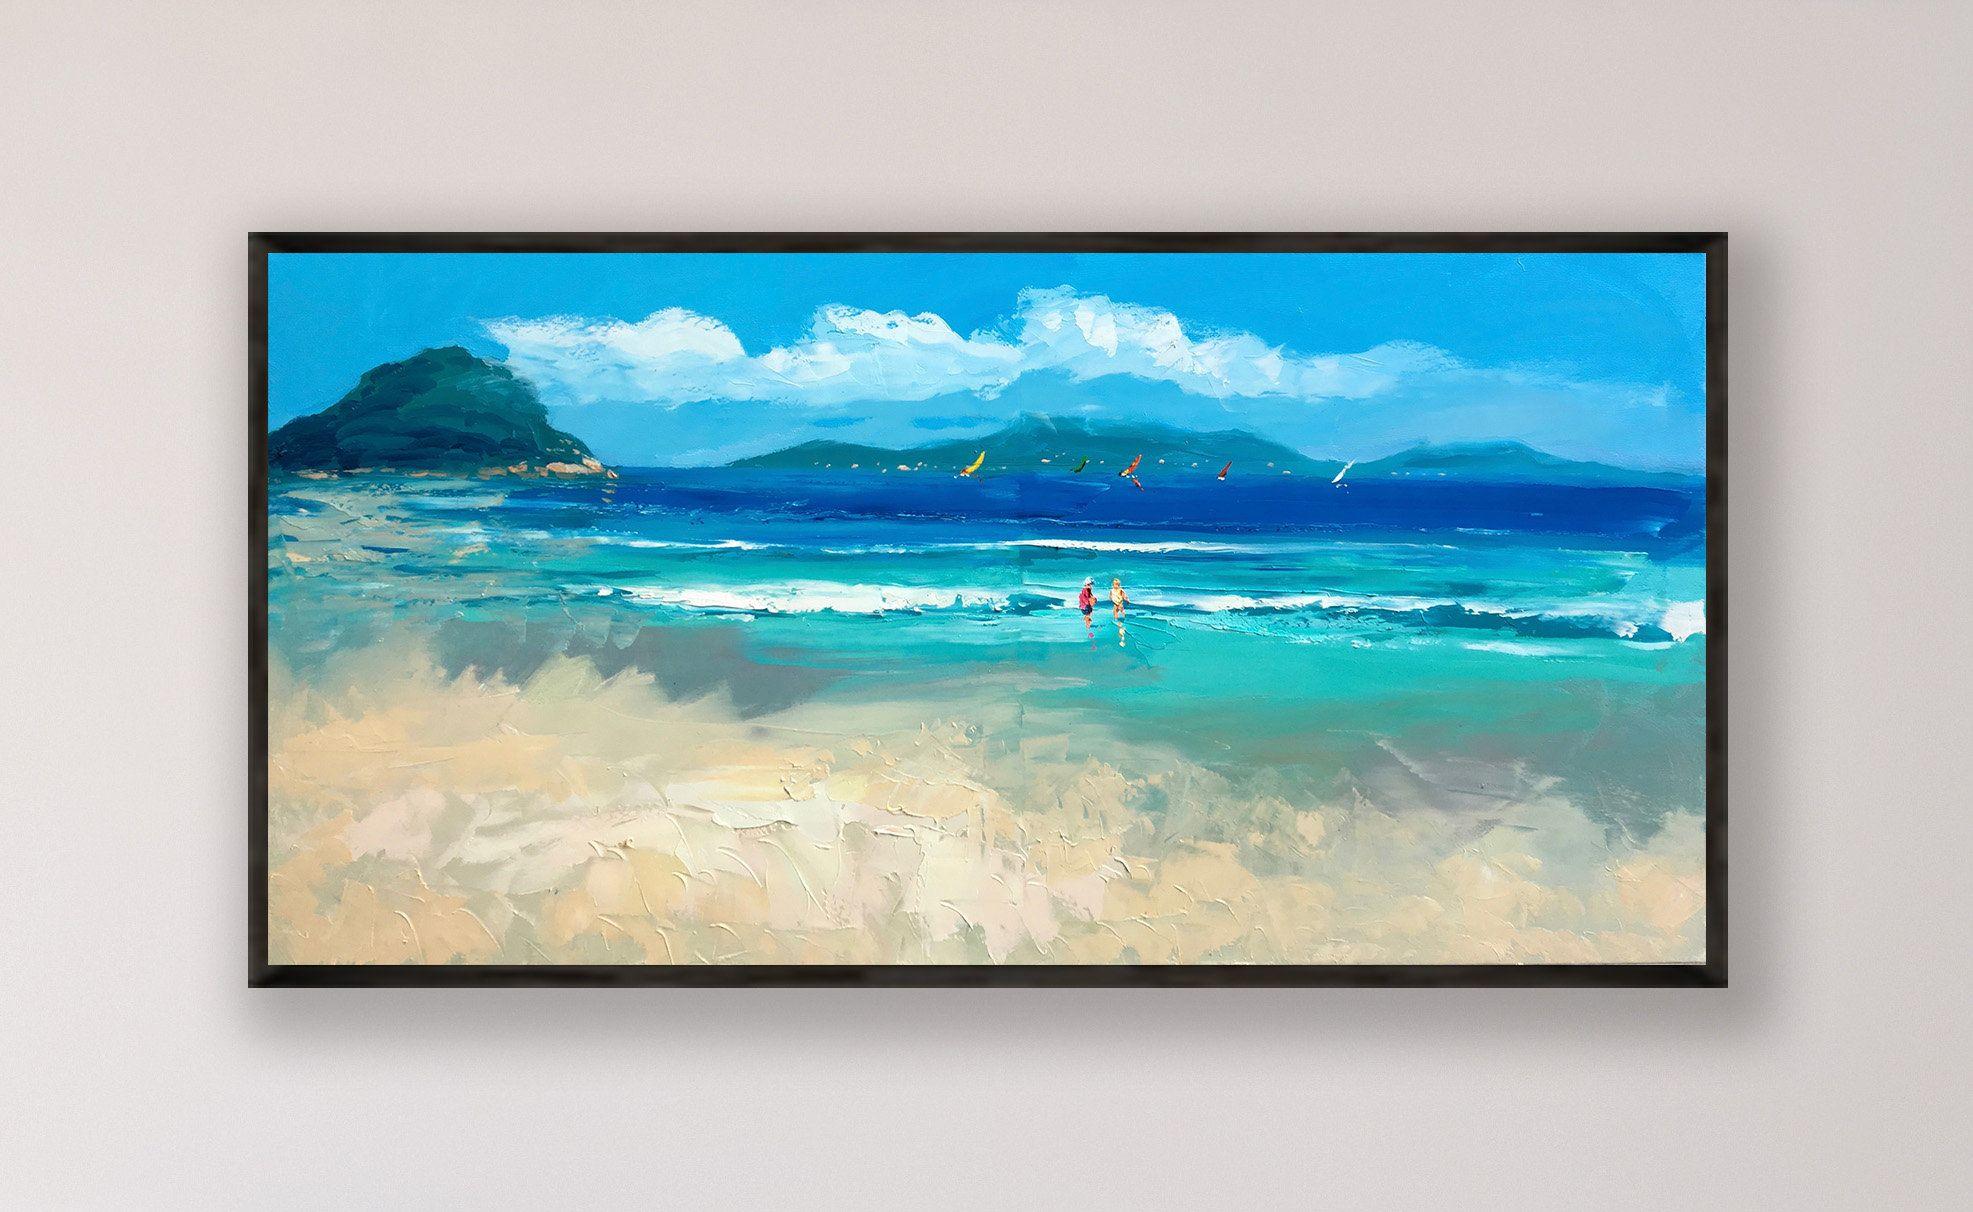 Tropical Beach Painting On Canvas Original Art Seascape Painting